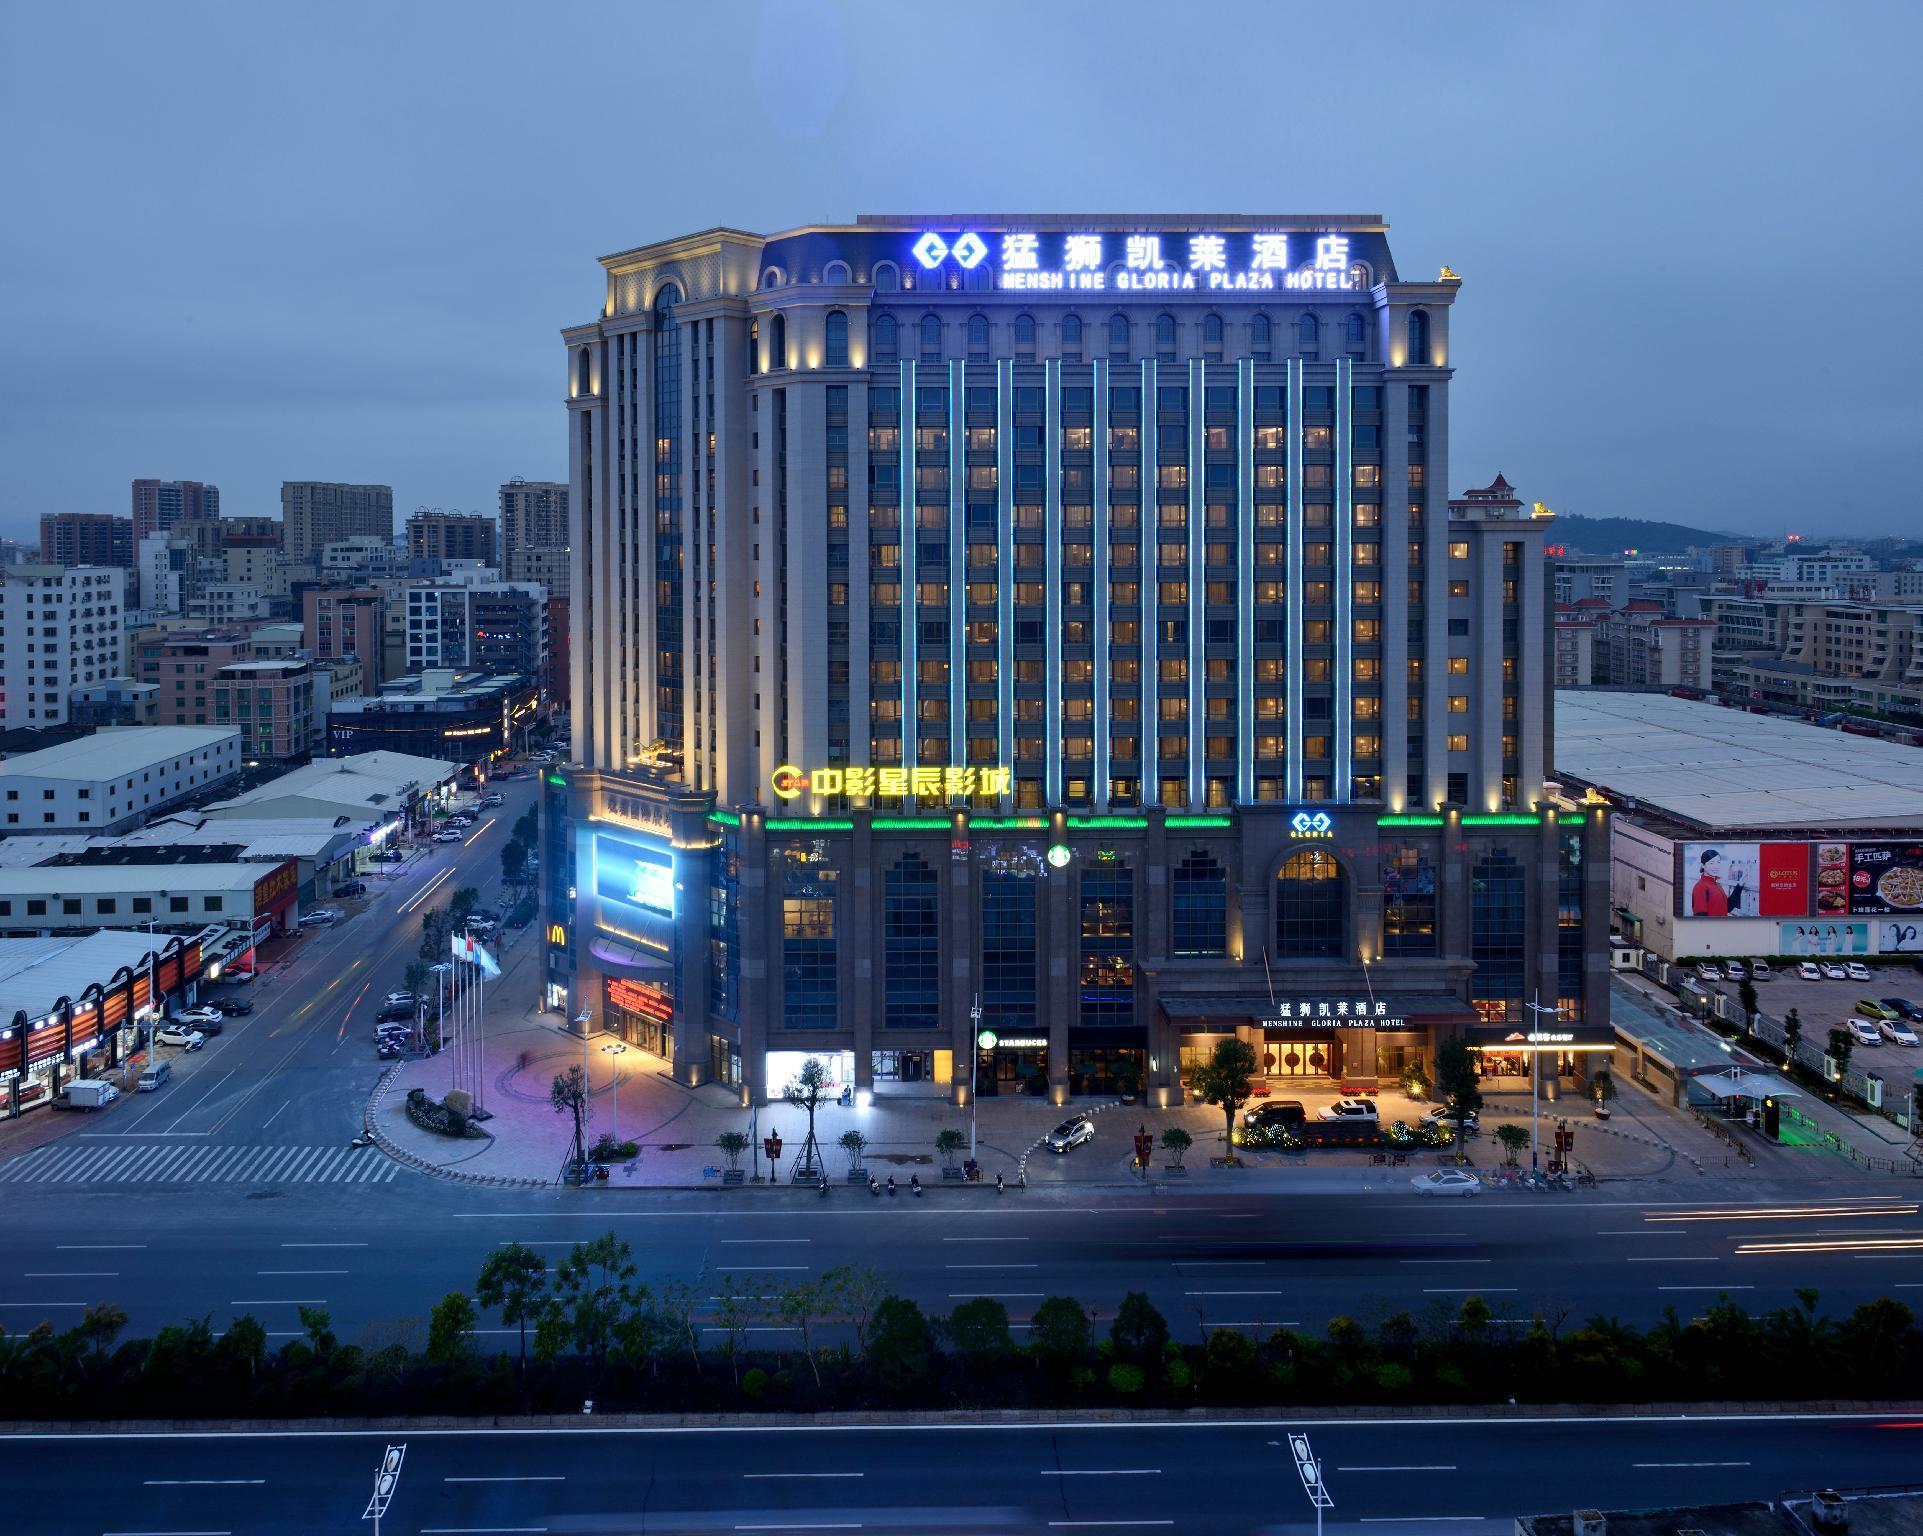 Menshine Gloria Plaza Hotel